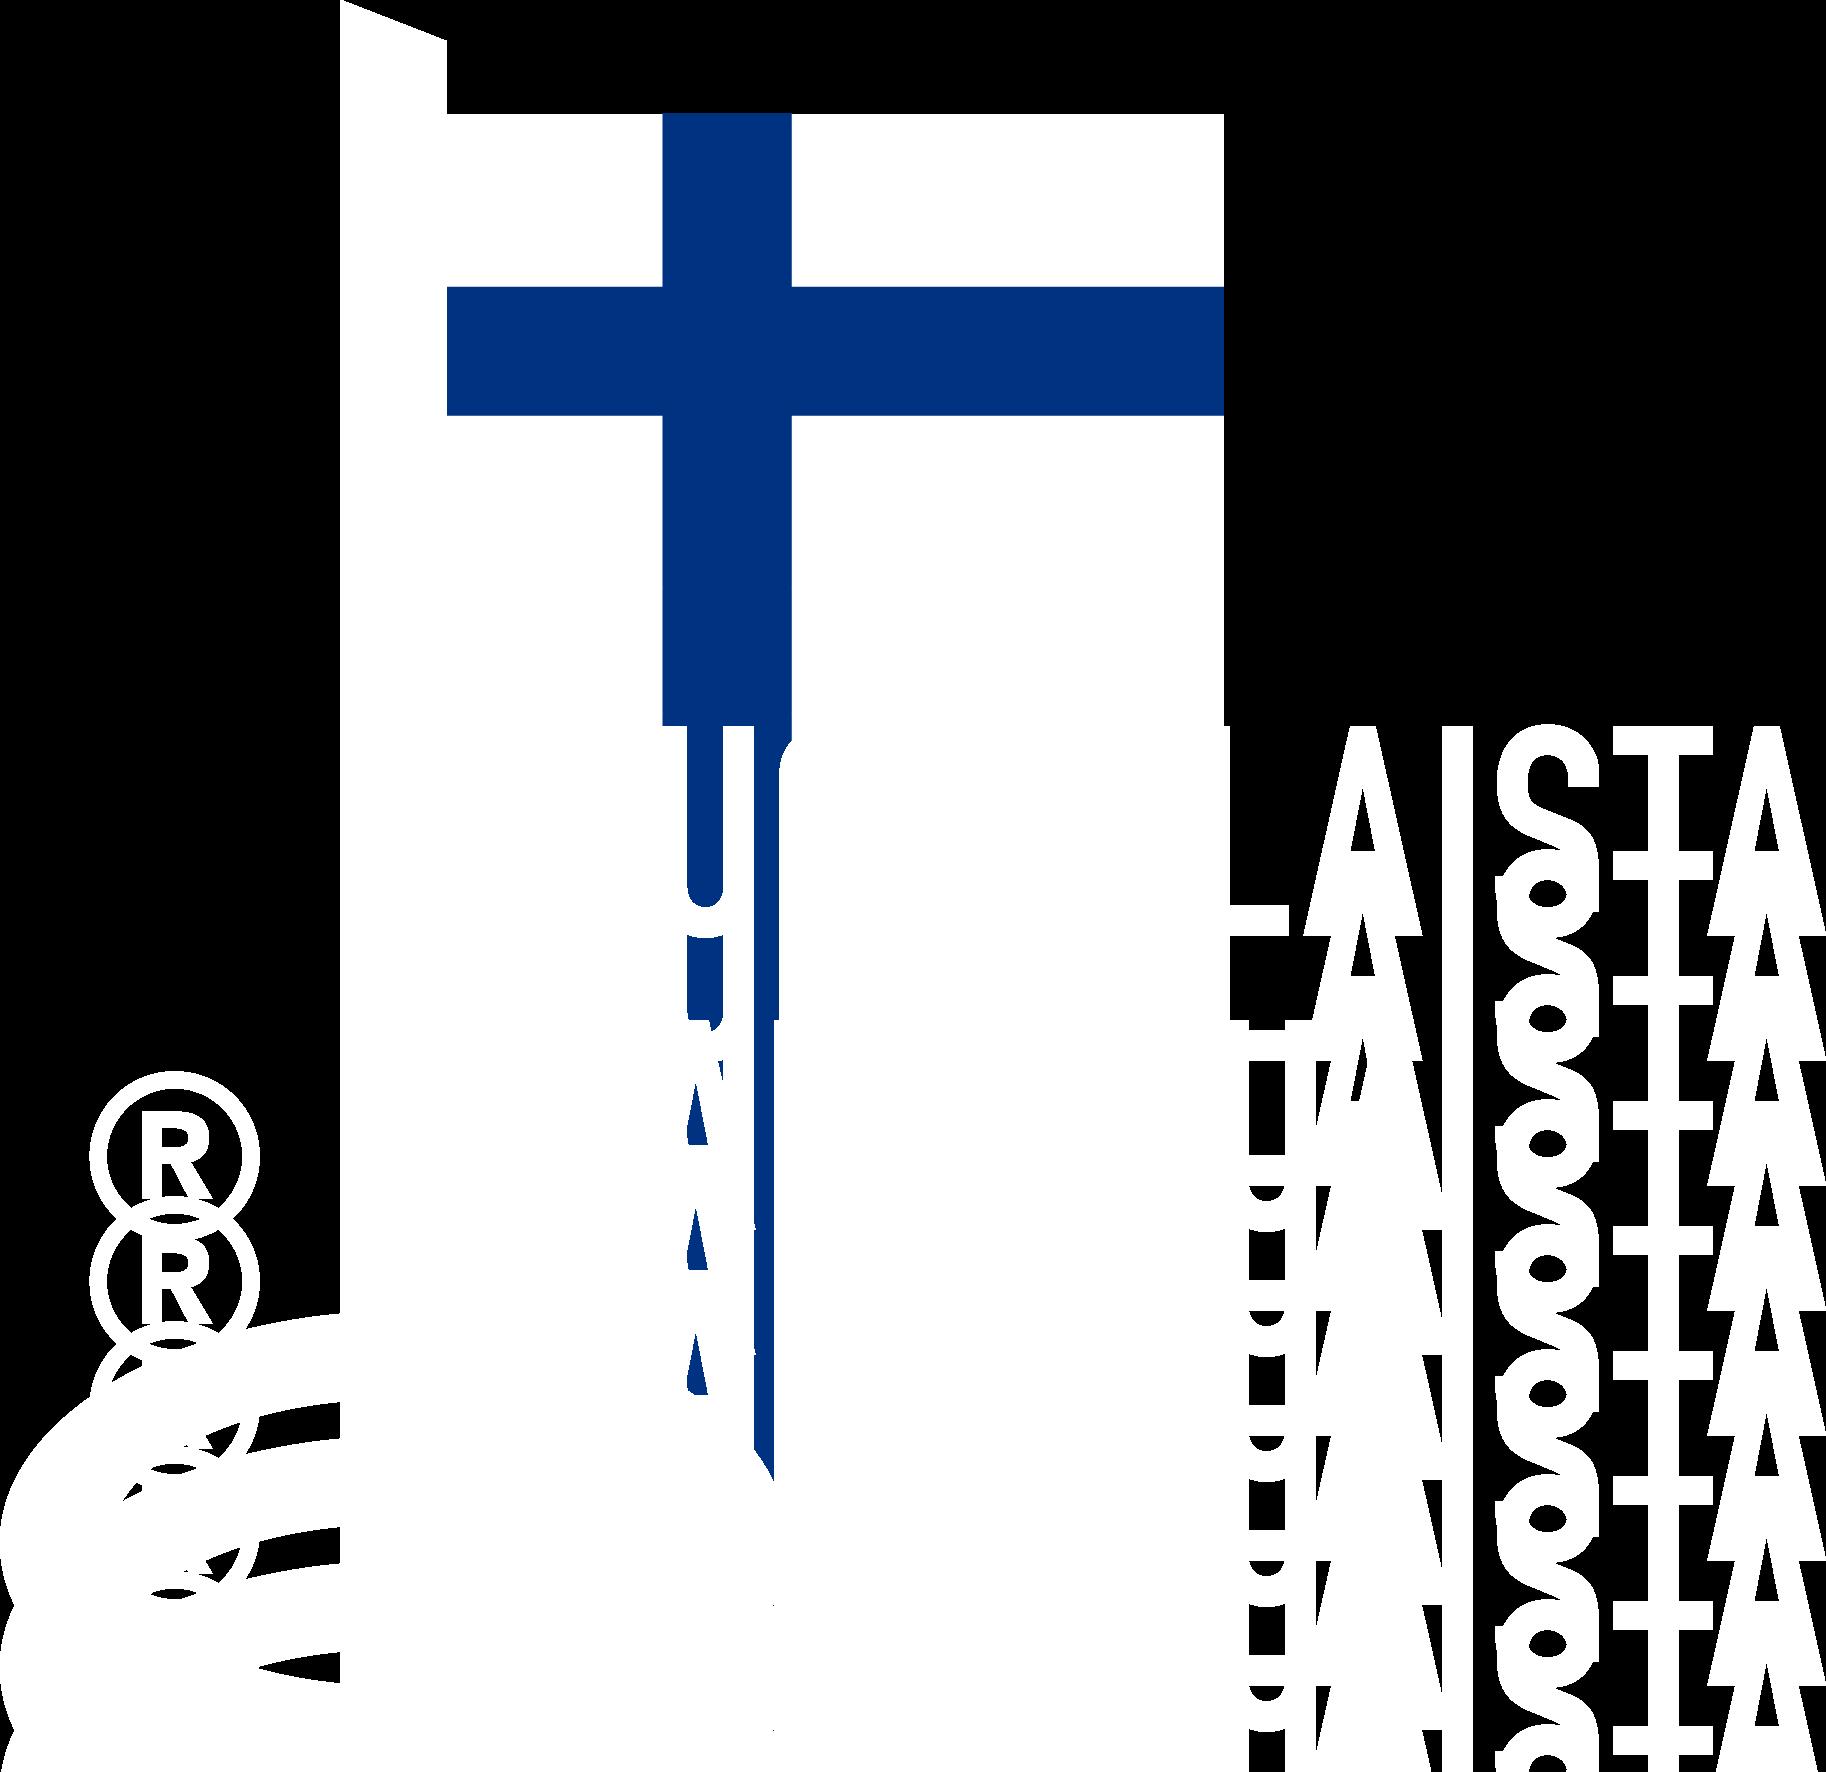 Avainlippu-merkki.